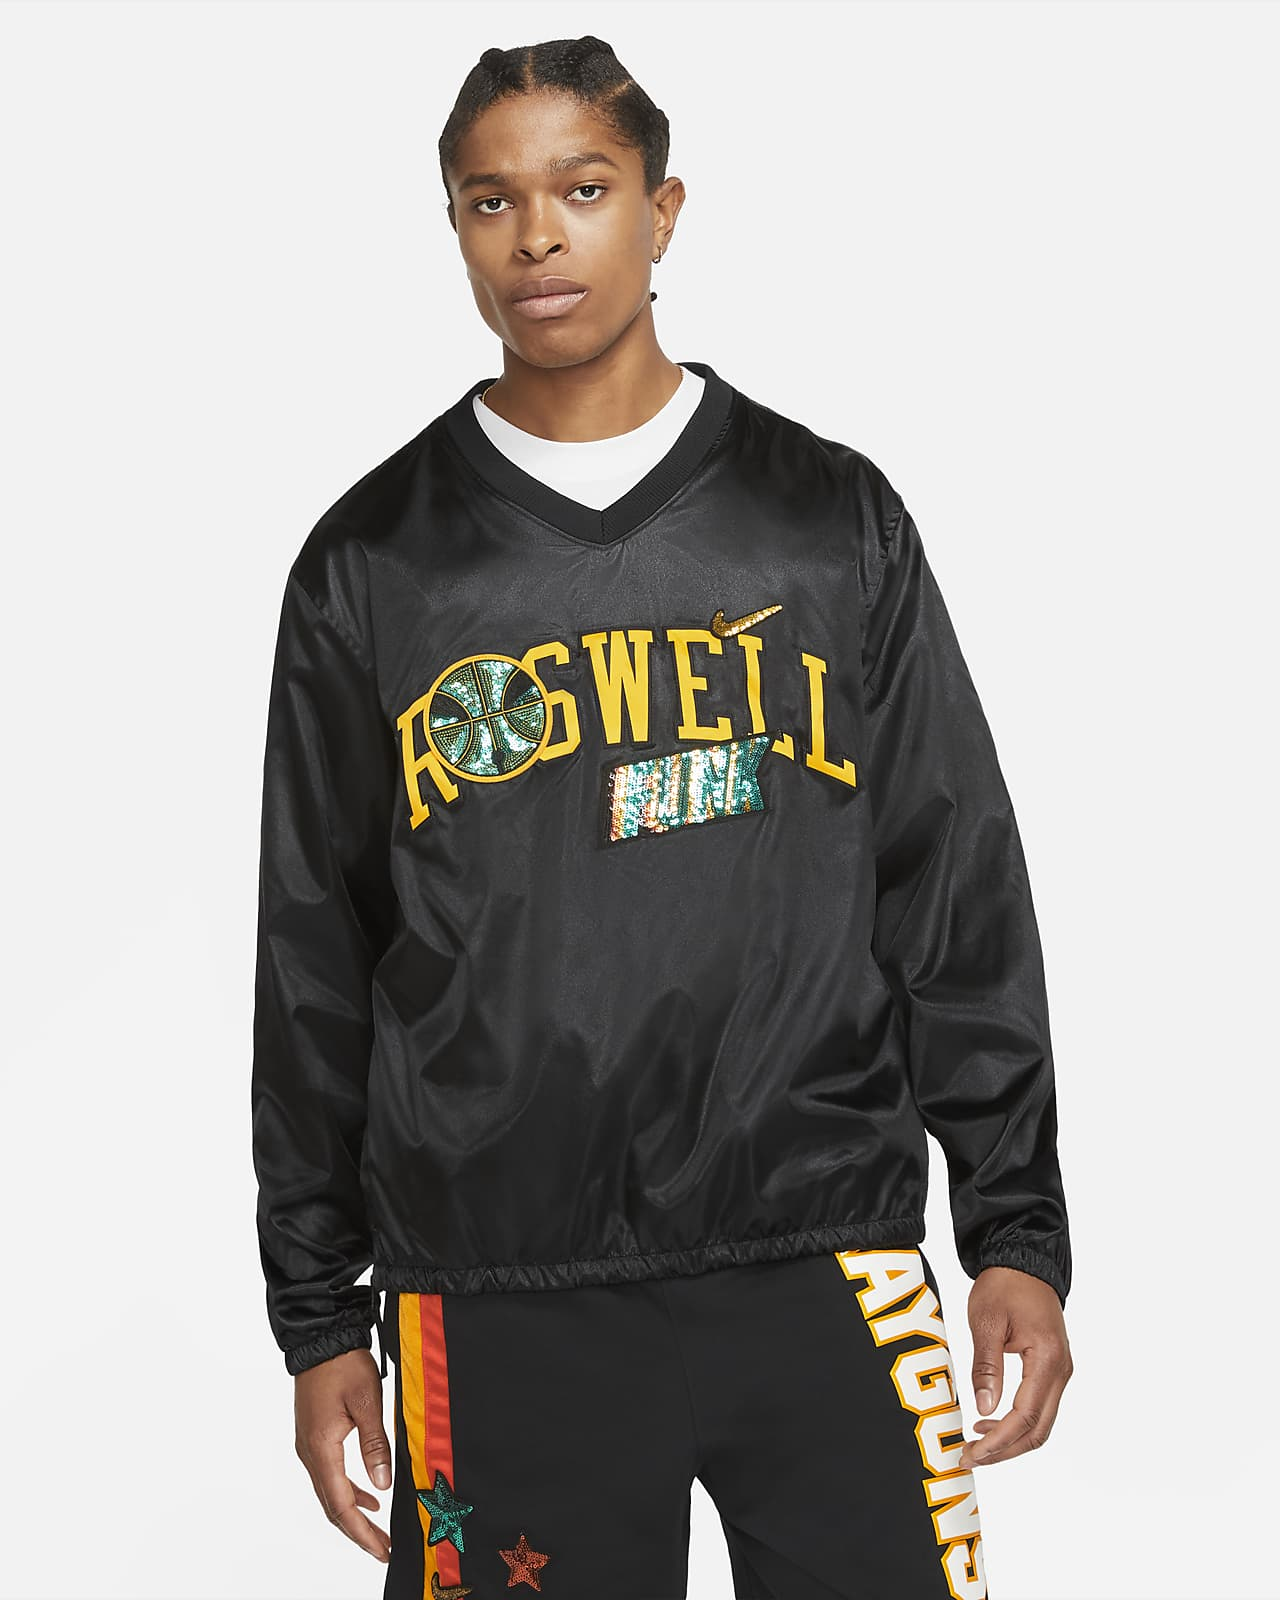 Nike Rayguns Men's Premium Basketball Top